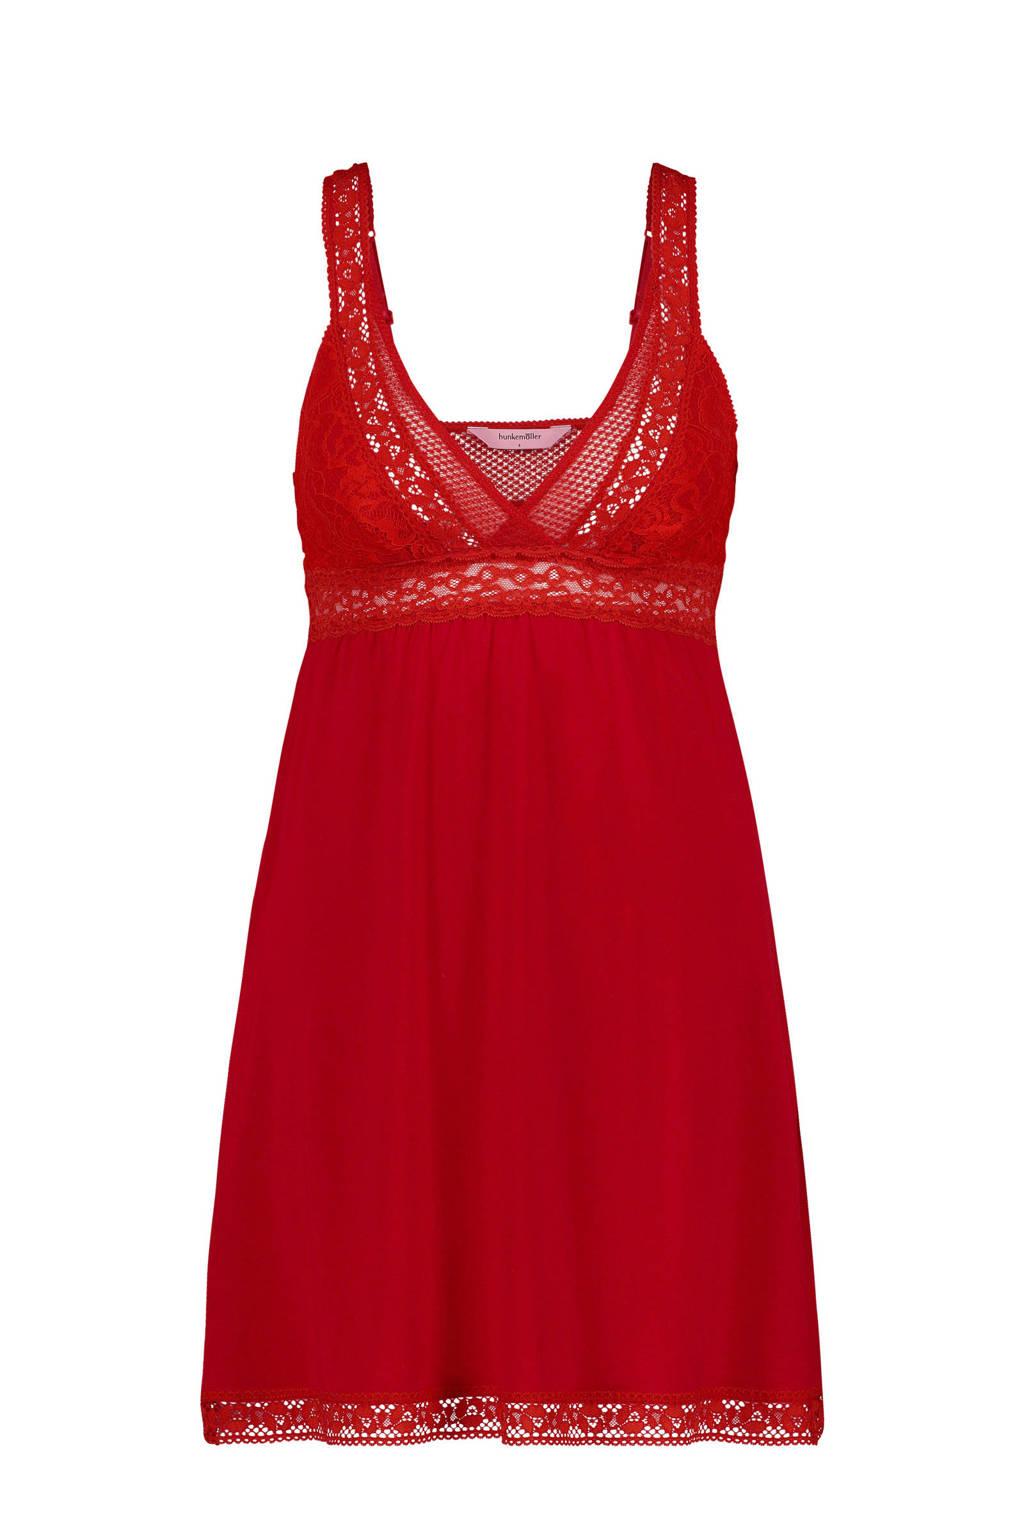 Hunkemöller slipdress Graphic lace met kant rood, Rood